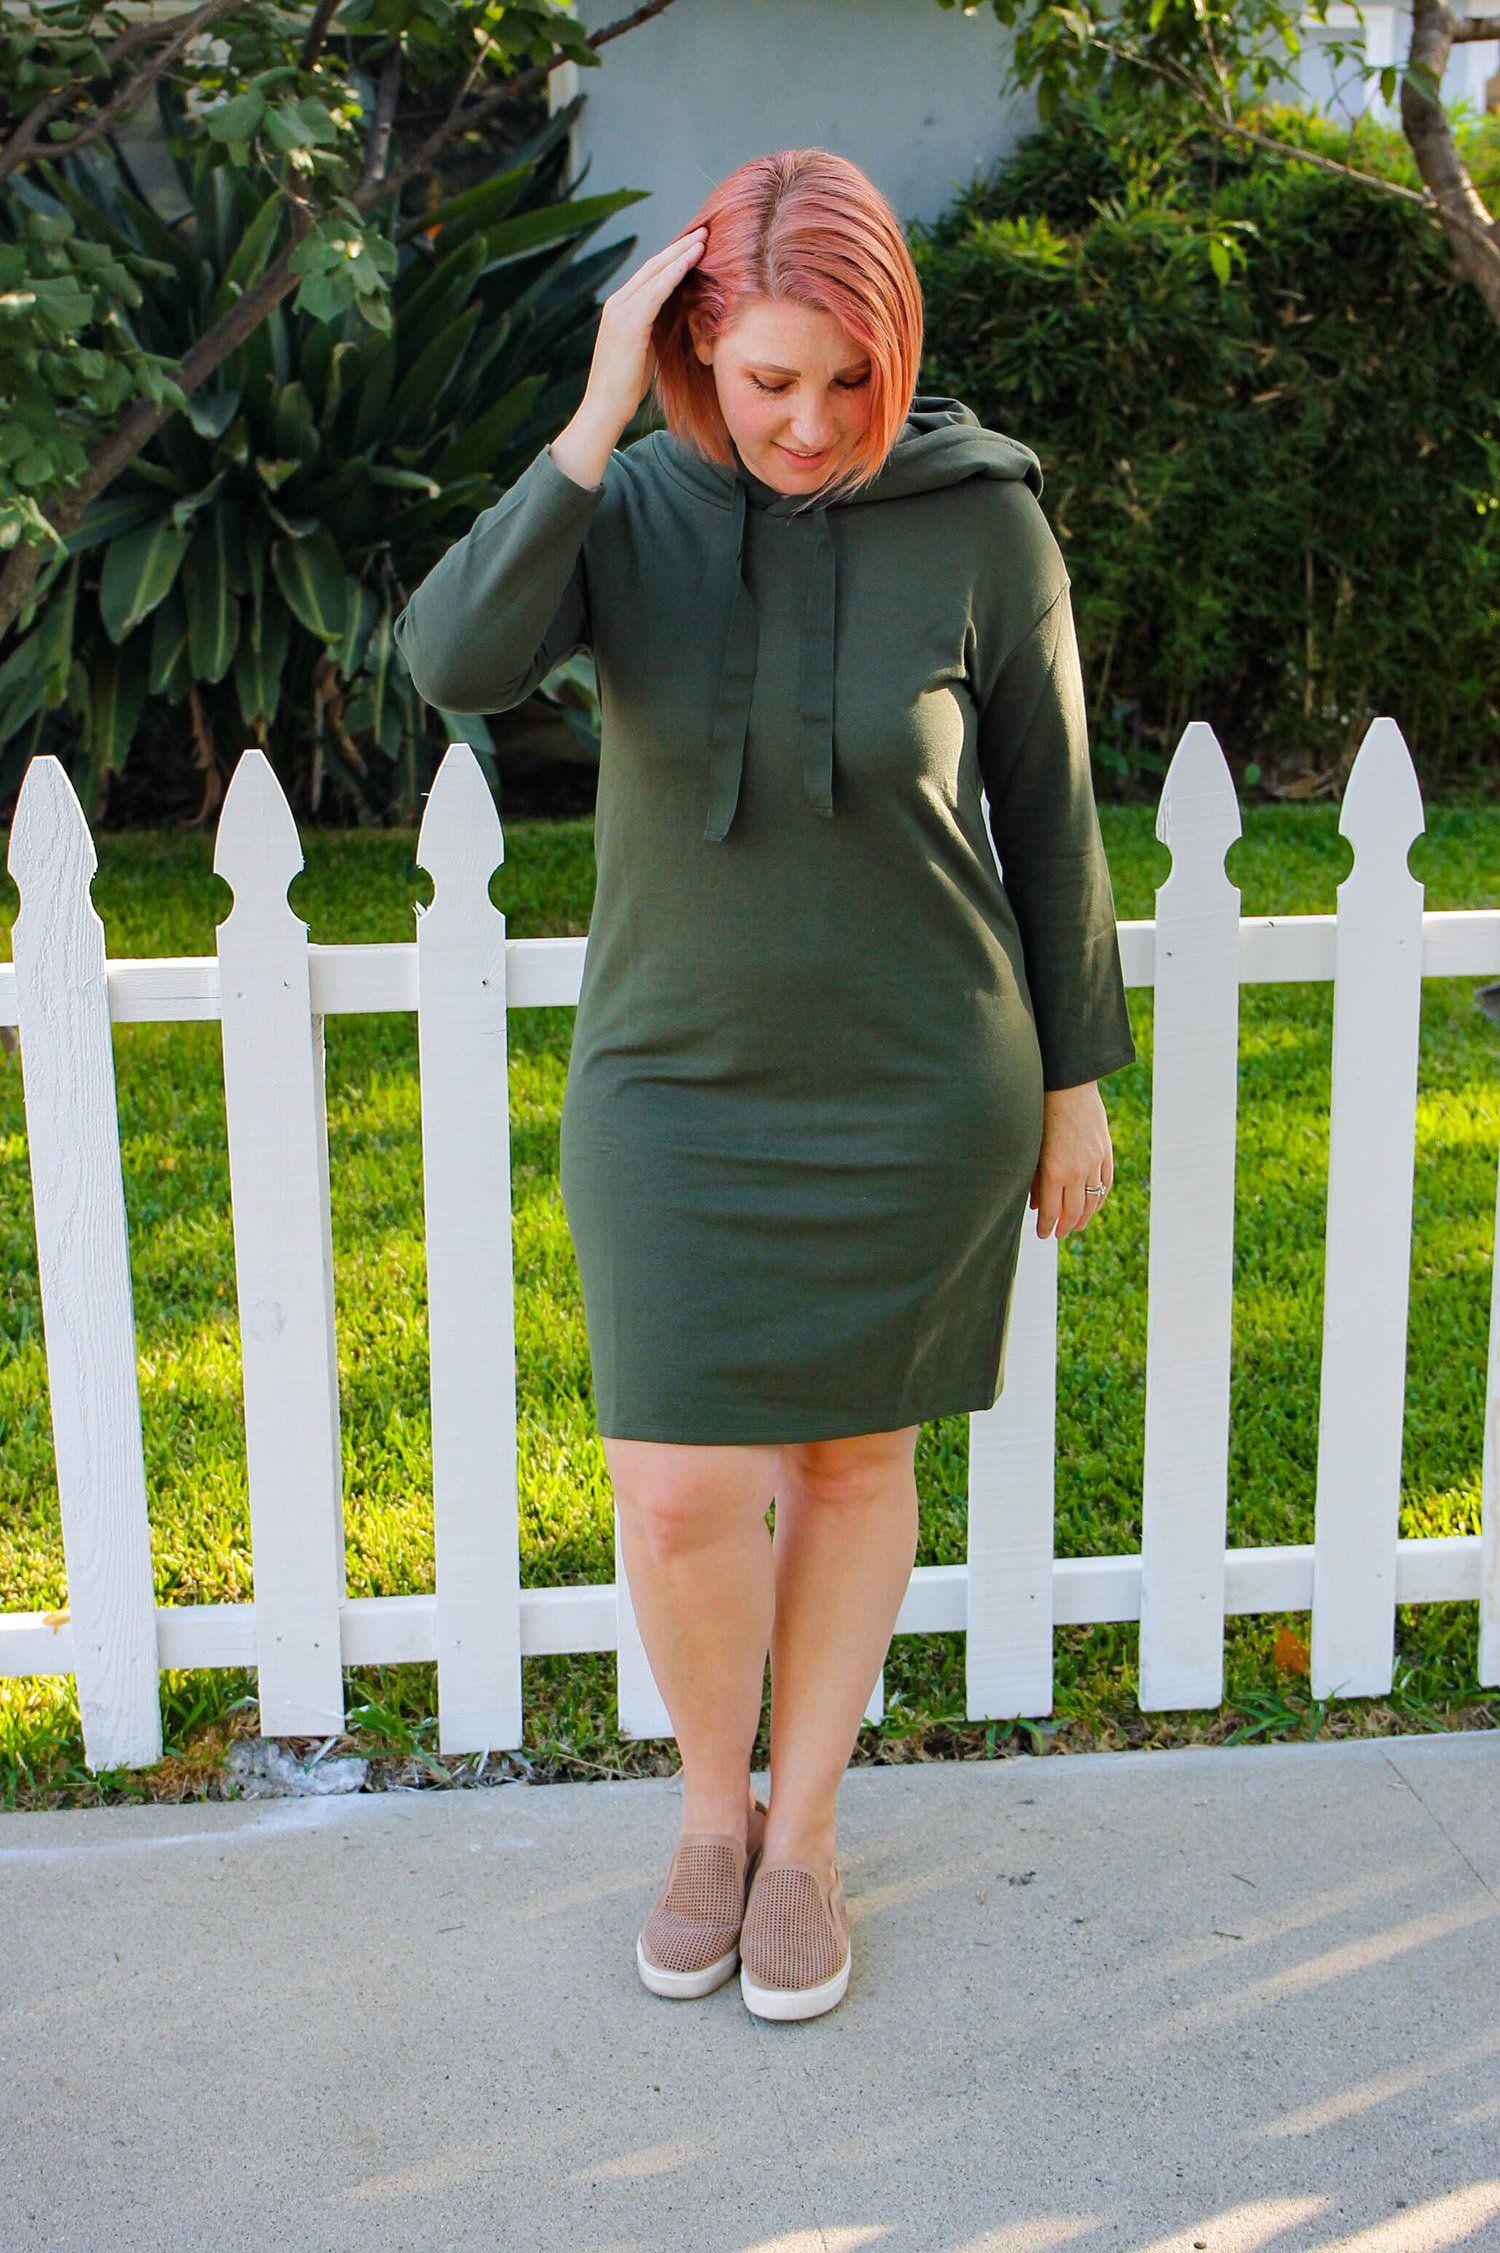 c3231de21350 Amazon Prime Wardrobe: October Favorites | Fashion // Easy Style ...